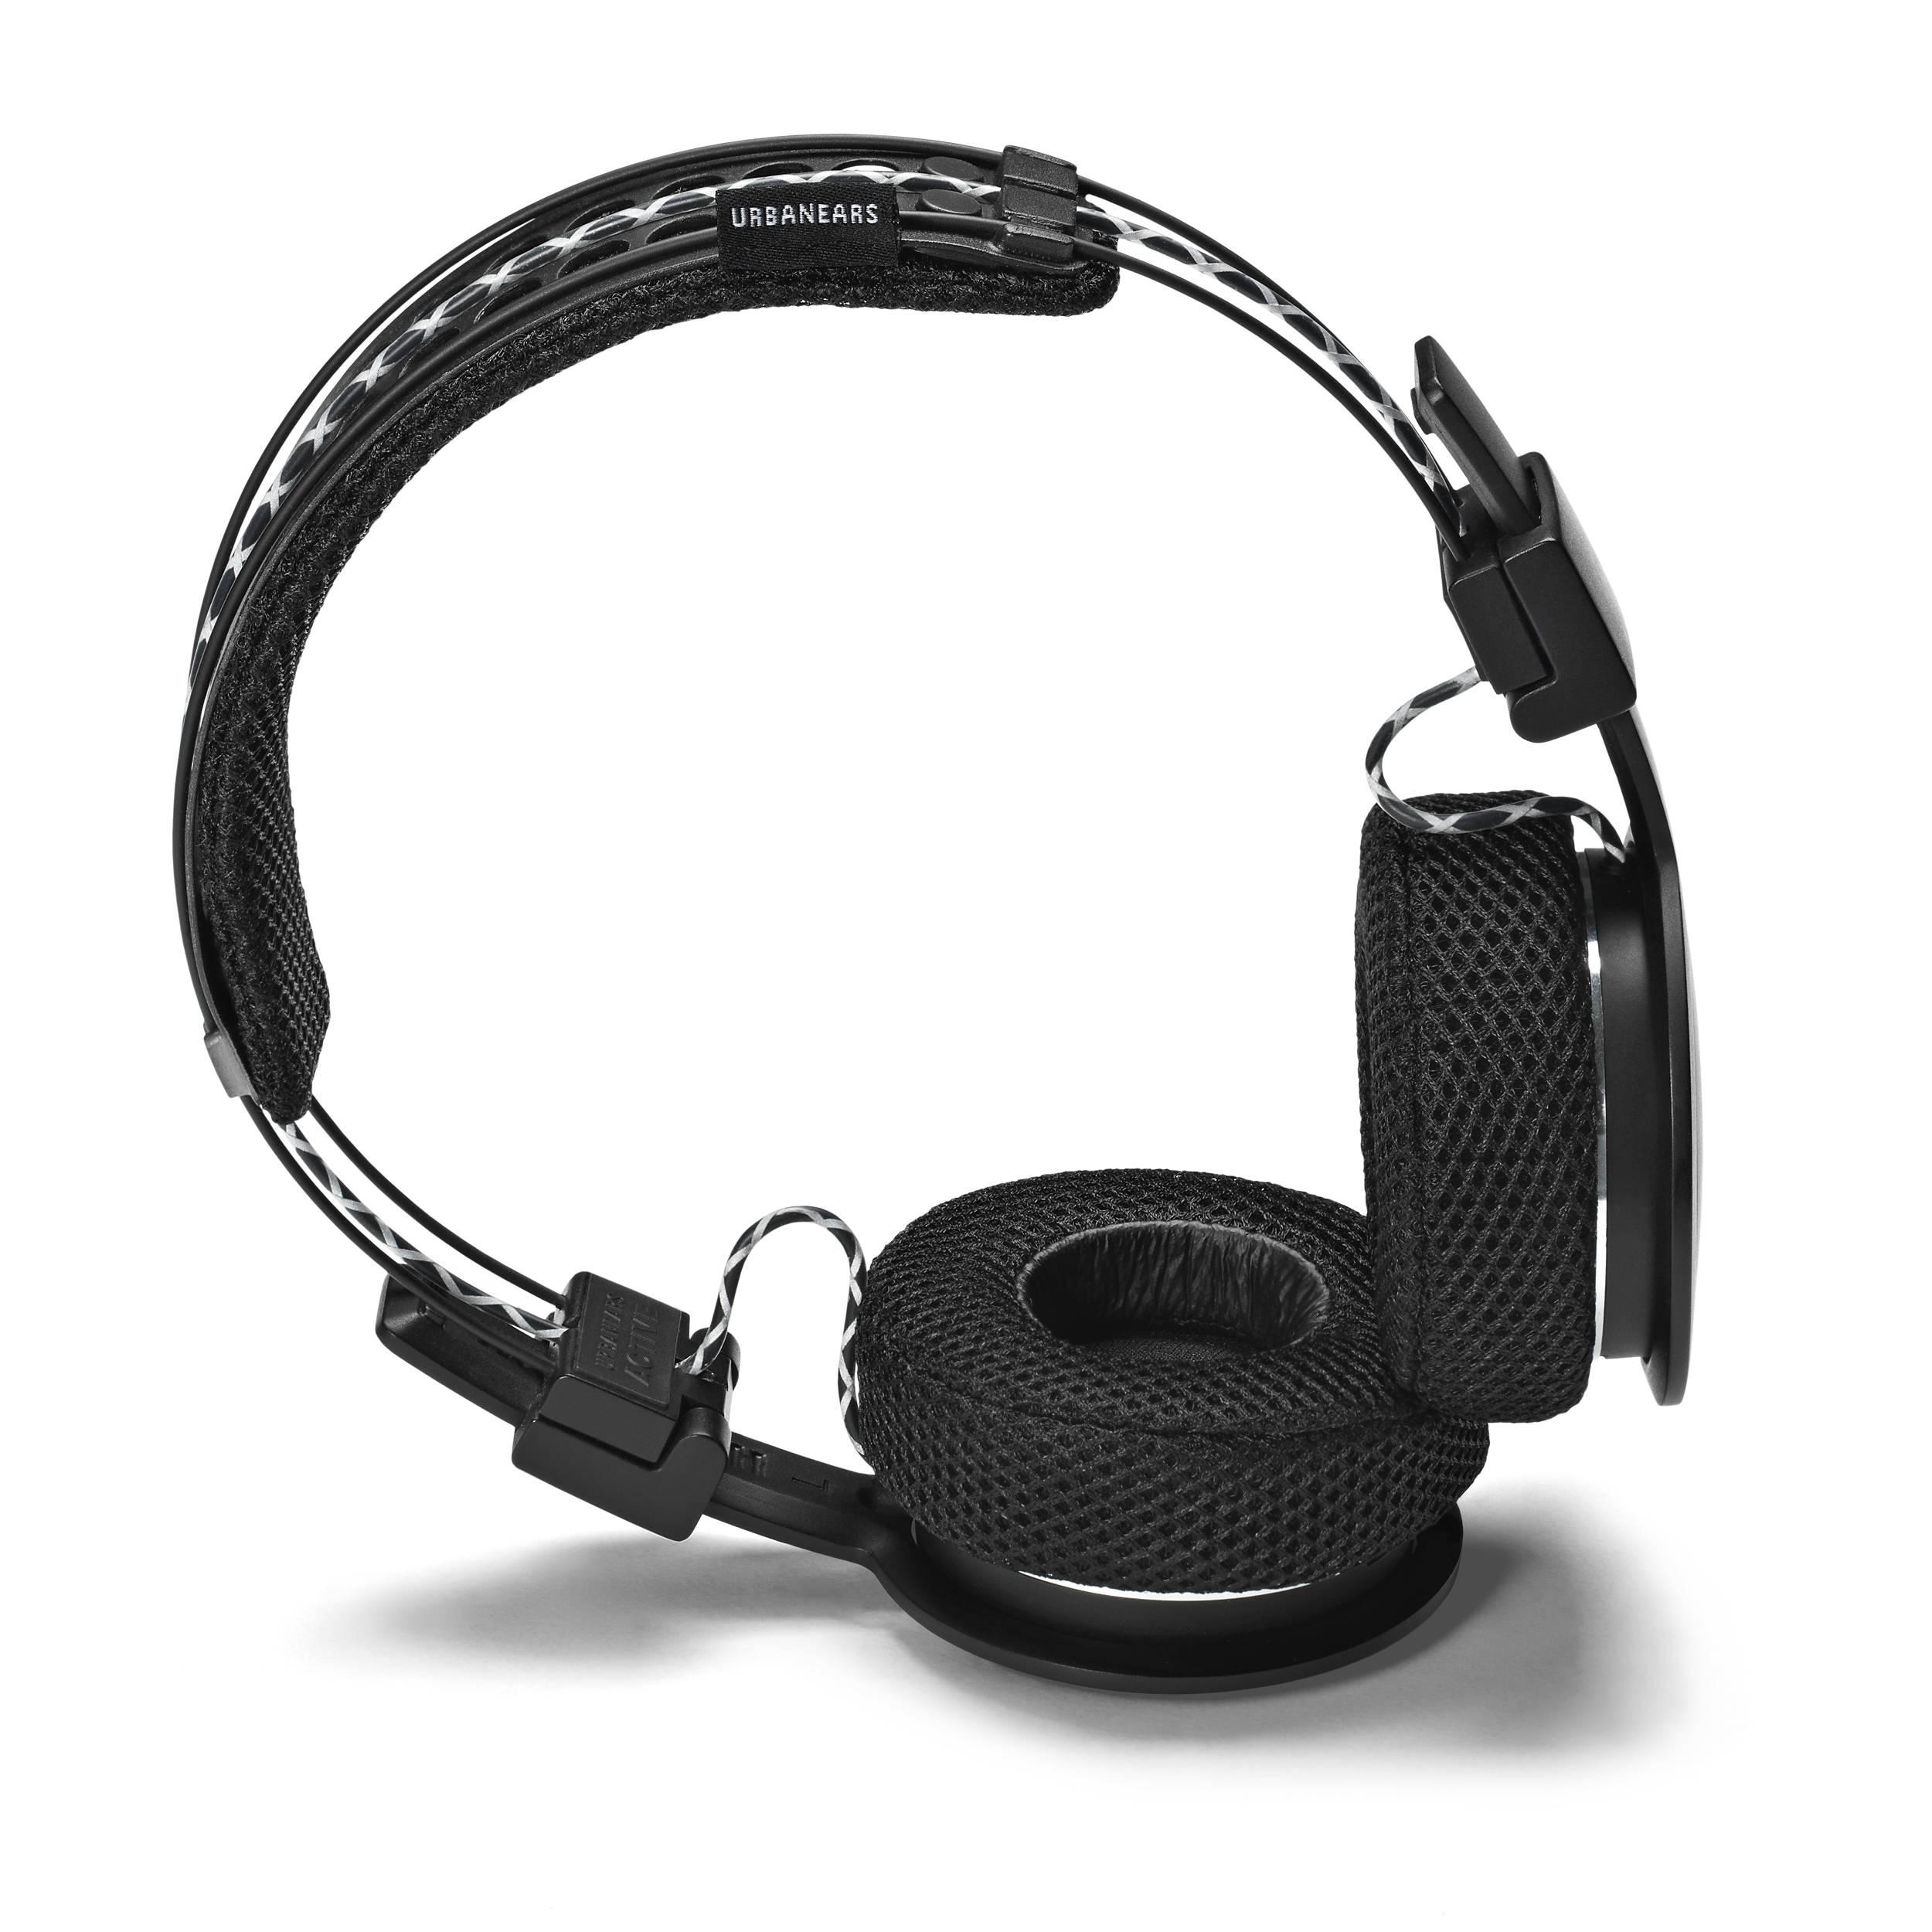 def4f772ee1 Urbanears Hellas On-Ear Wireless Bluetooth Headphones 4091227